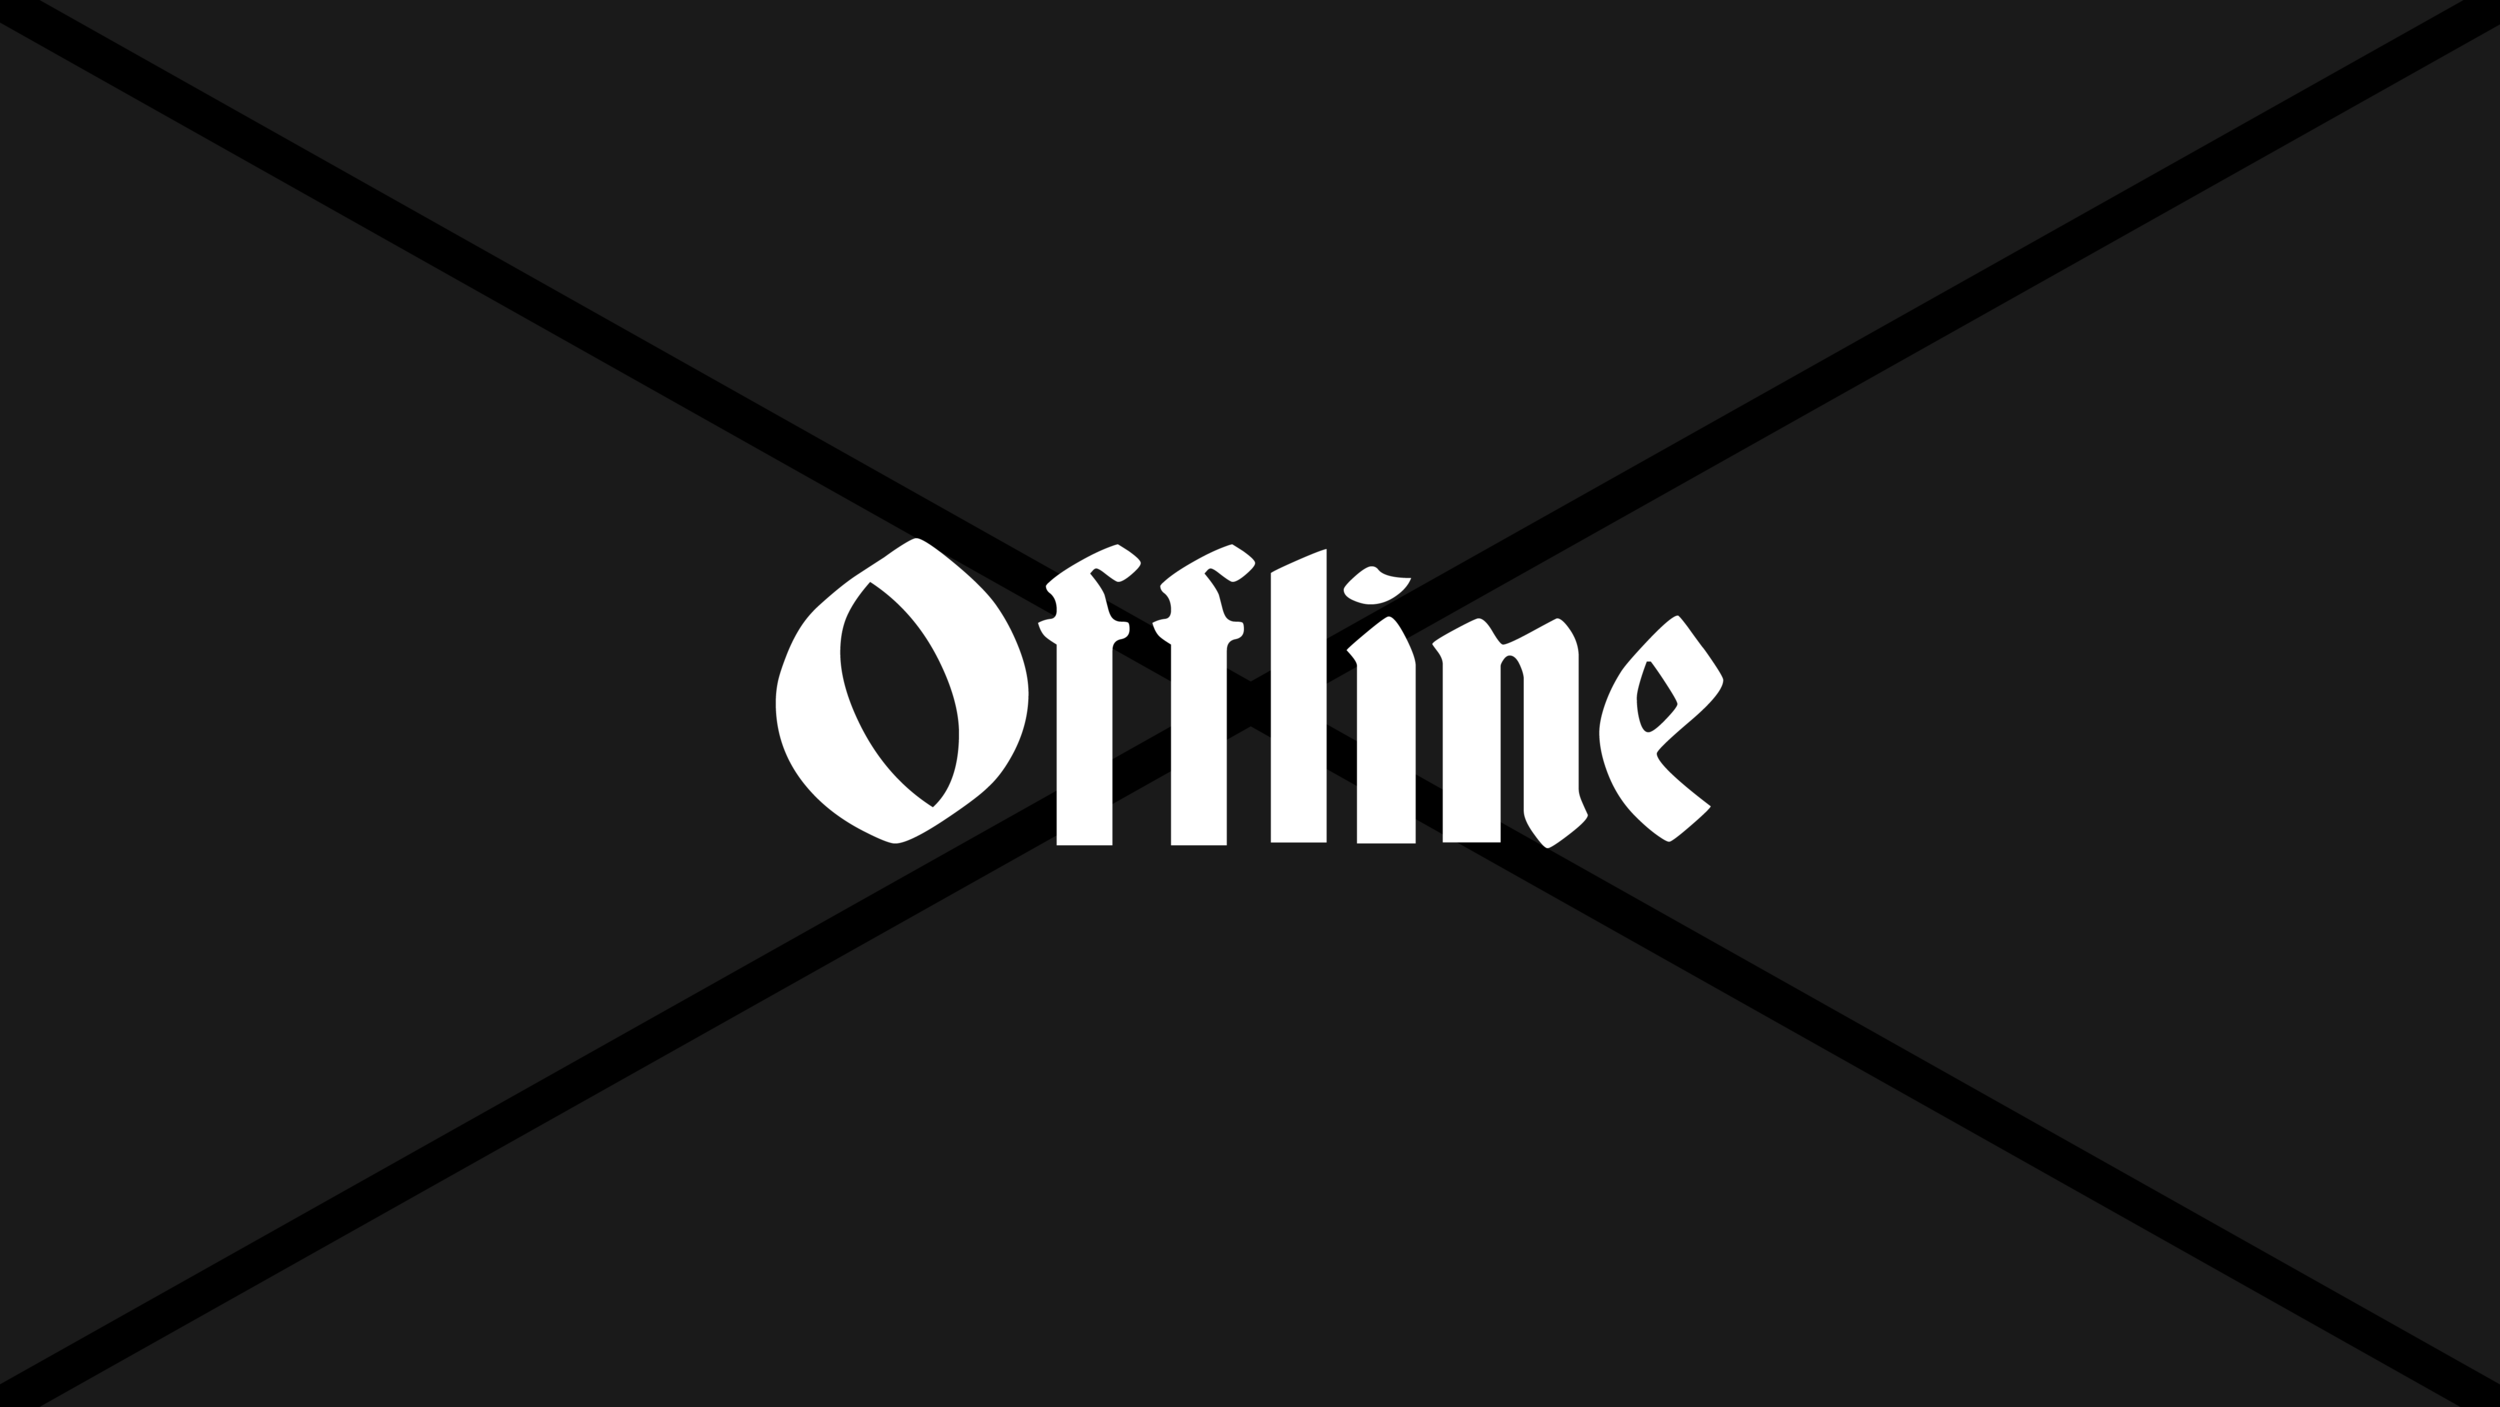 Madknight64_Branding_VG_Offline.png